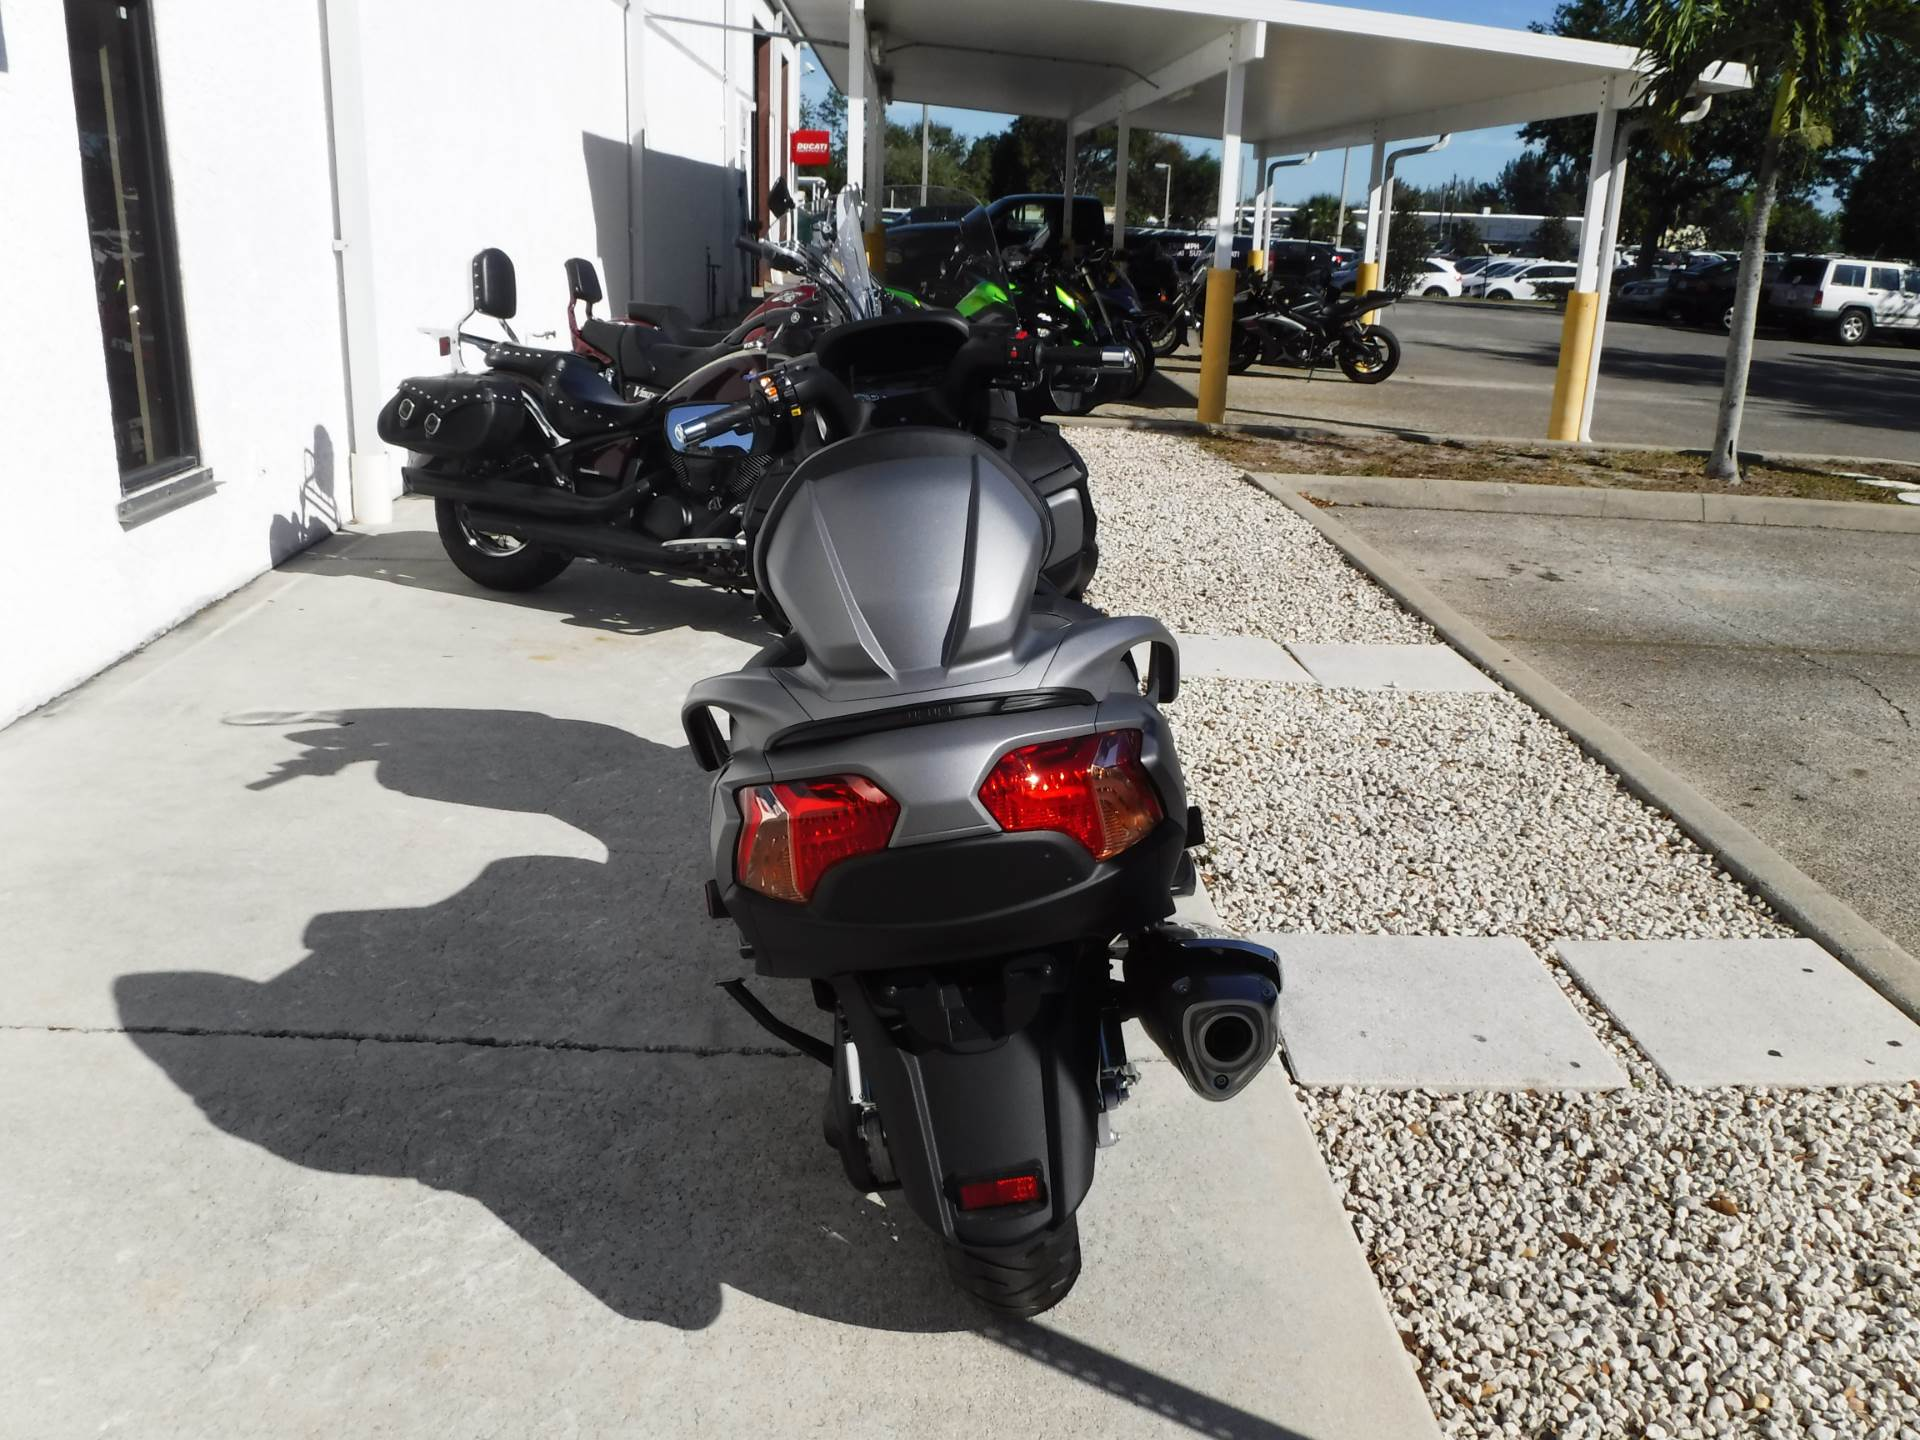 2015 Suzuki Burgman 650 ABS in Stuart, Florida